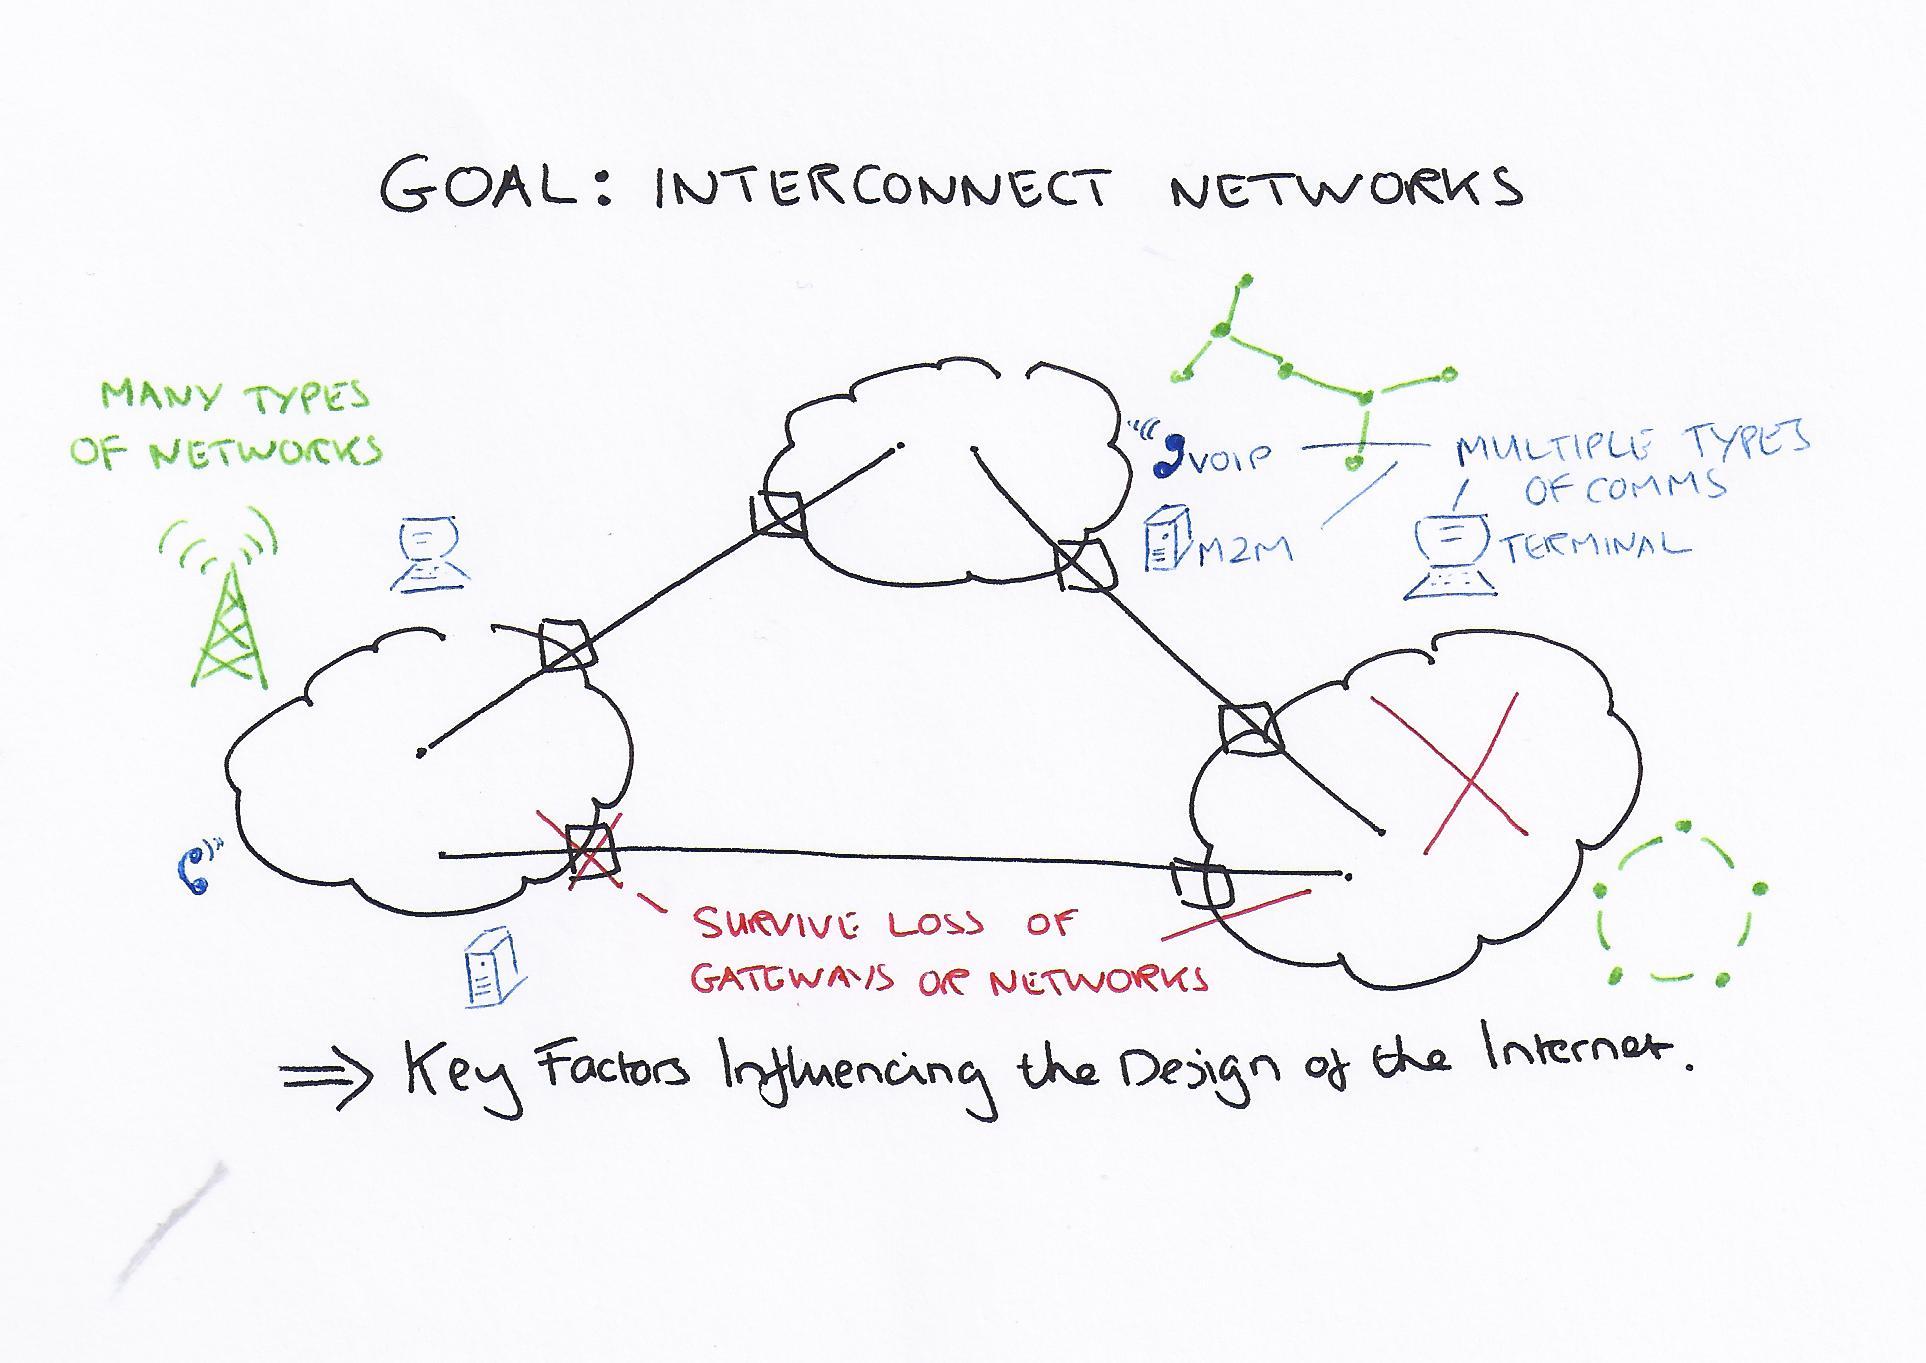 Design of the Internet